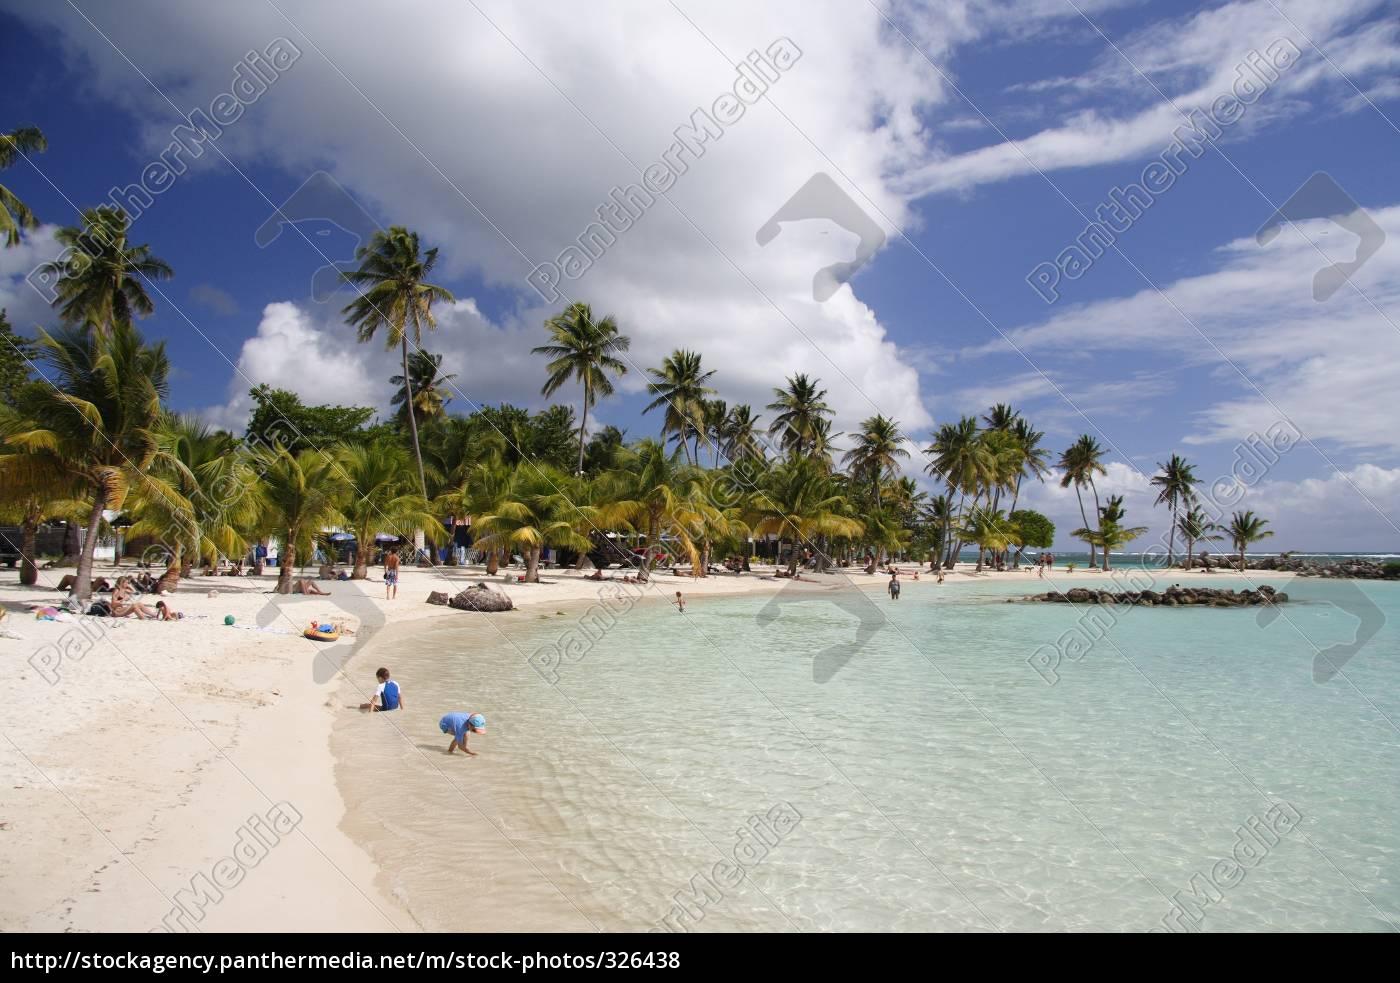 tropical, lagoon - 326438